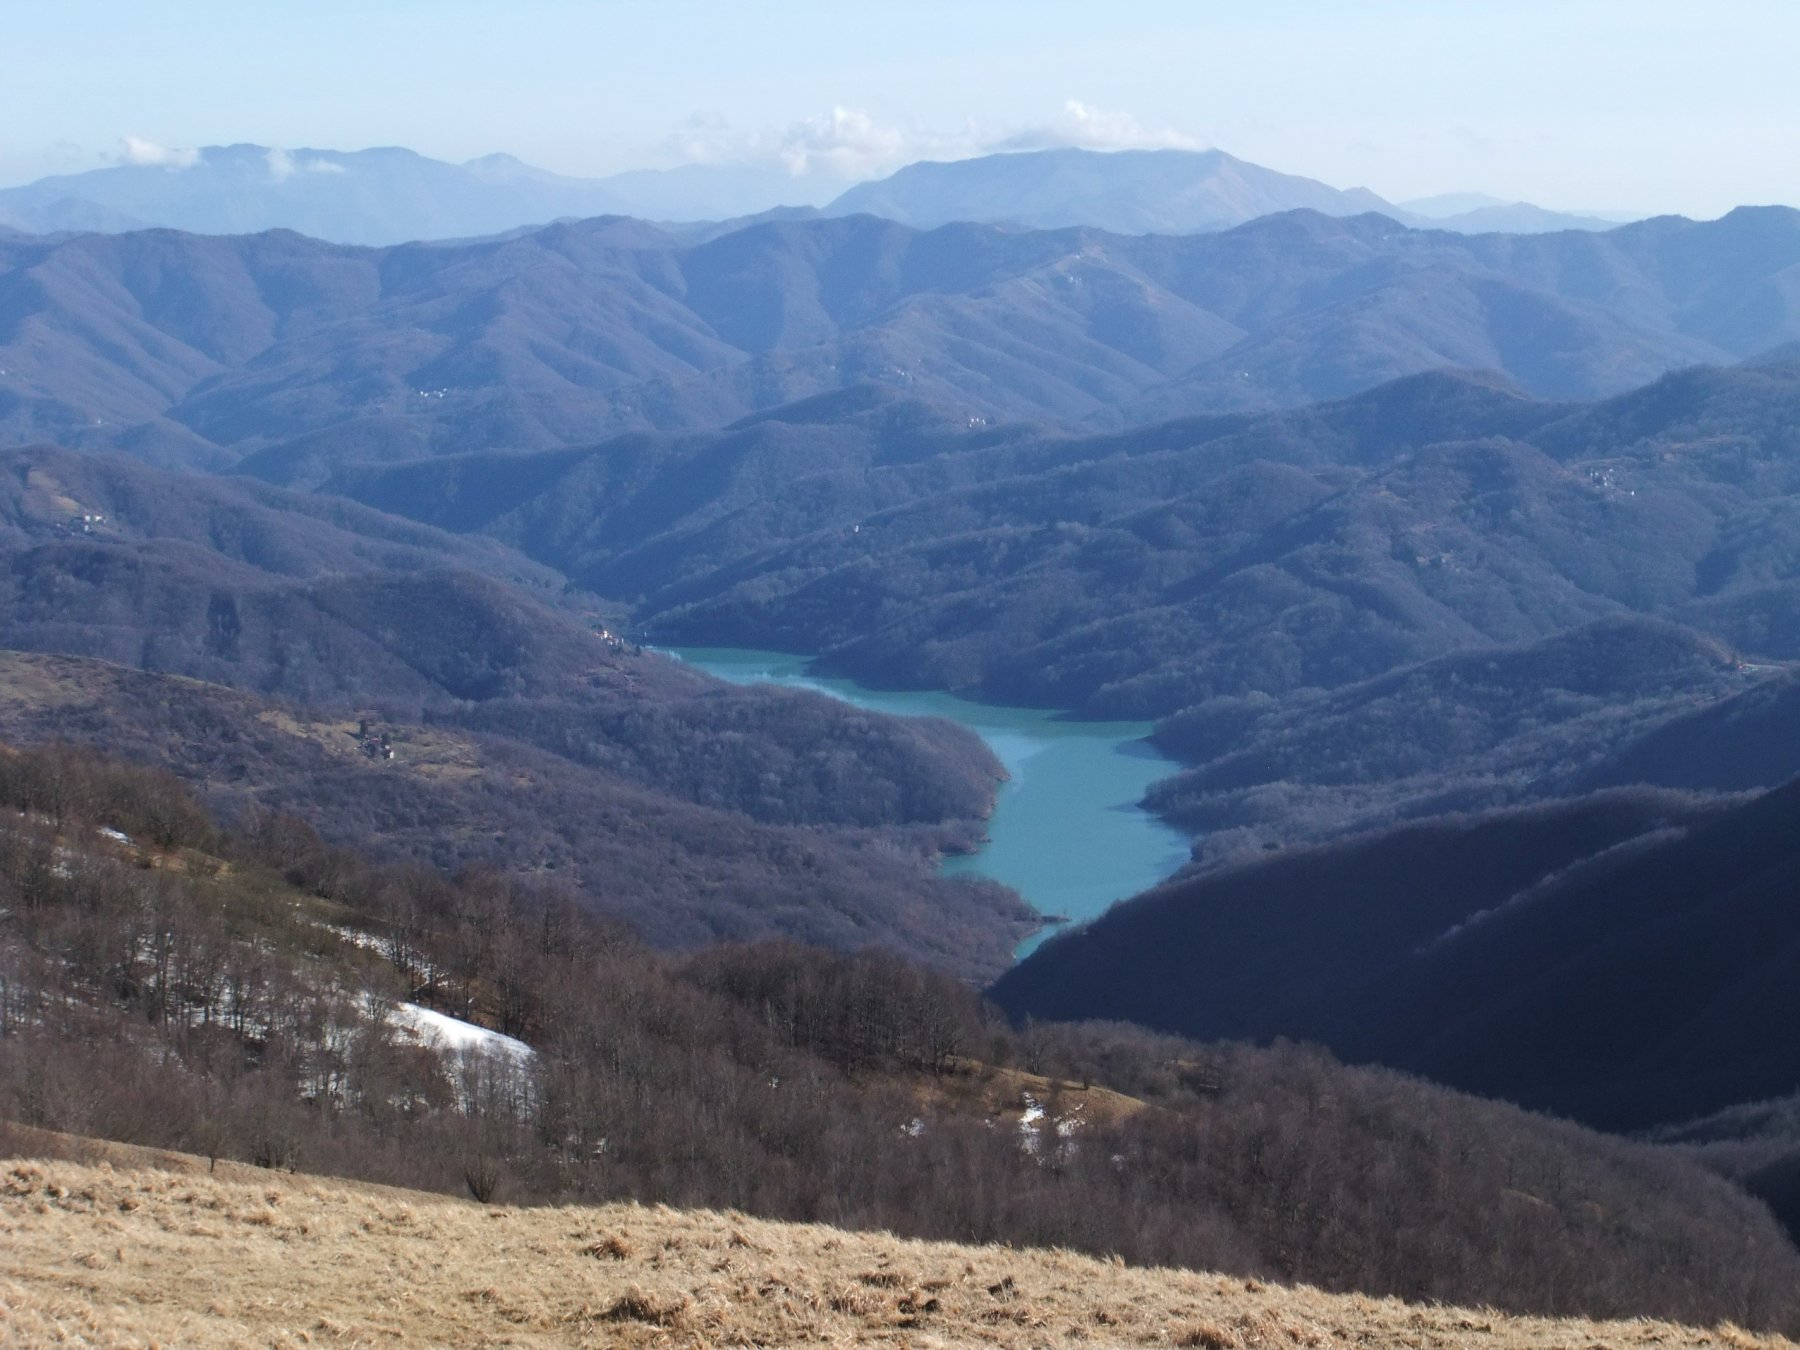 Antola (Monte) da Vallenzona 2020-04-15